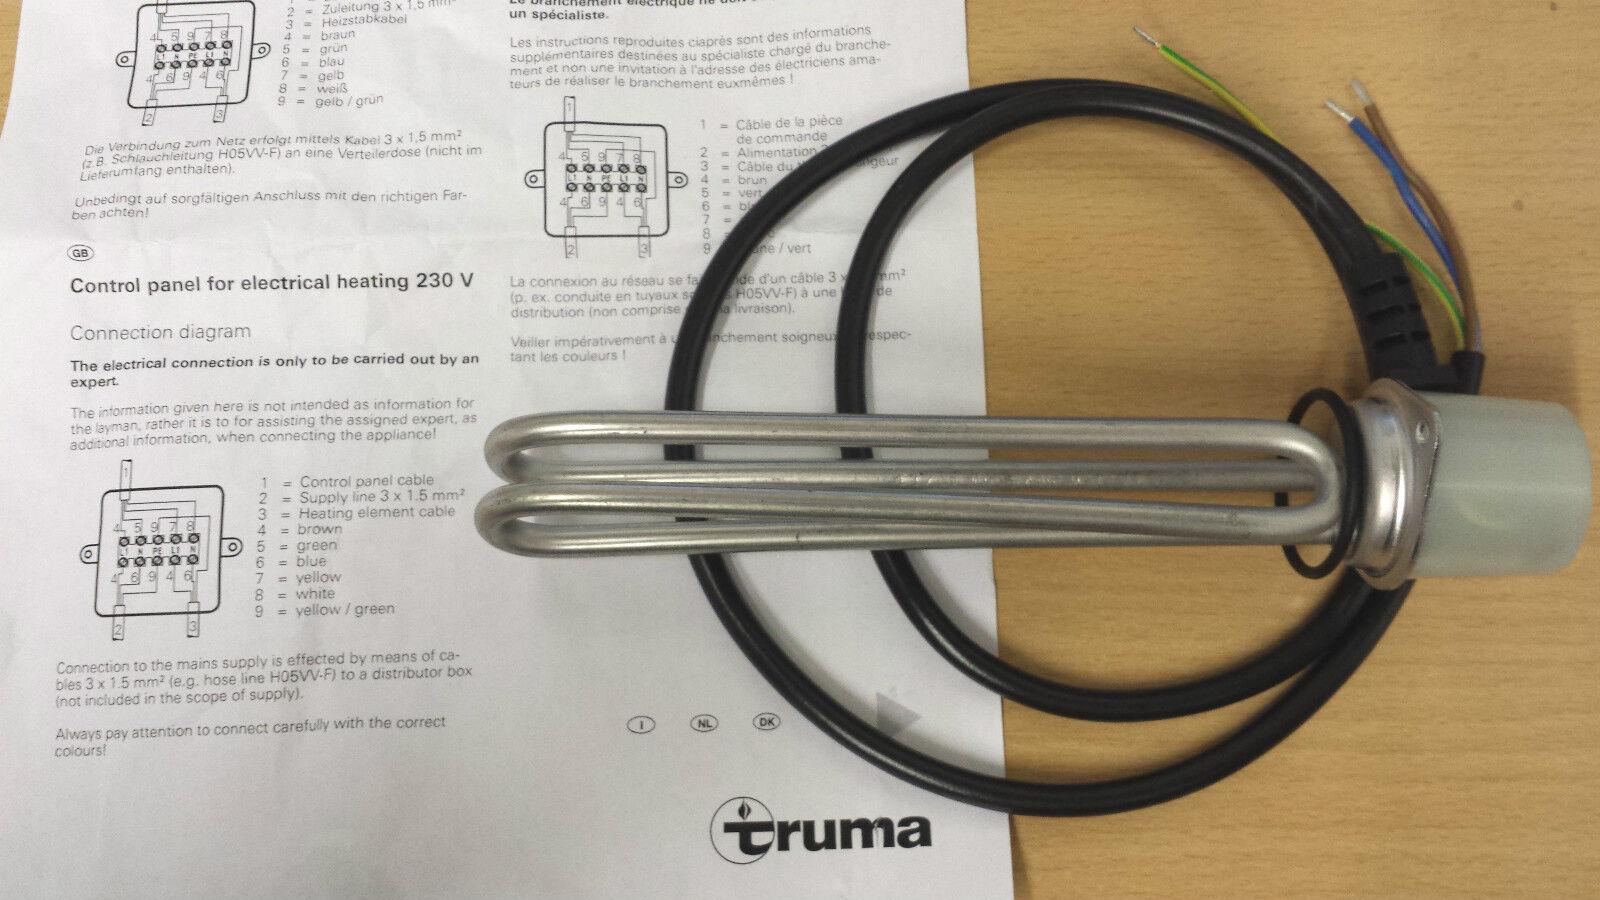 Truma Therme Heating Element 240v 300watts Ebay Caravan Heater Wiring Diagram Norton Secured Powered By Verisign